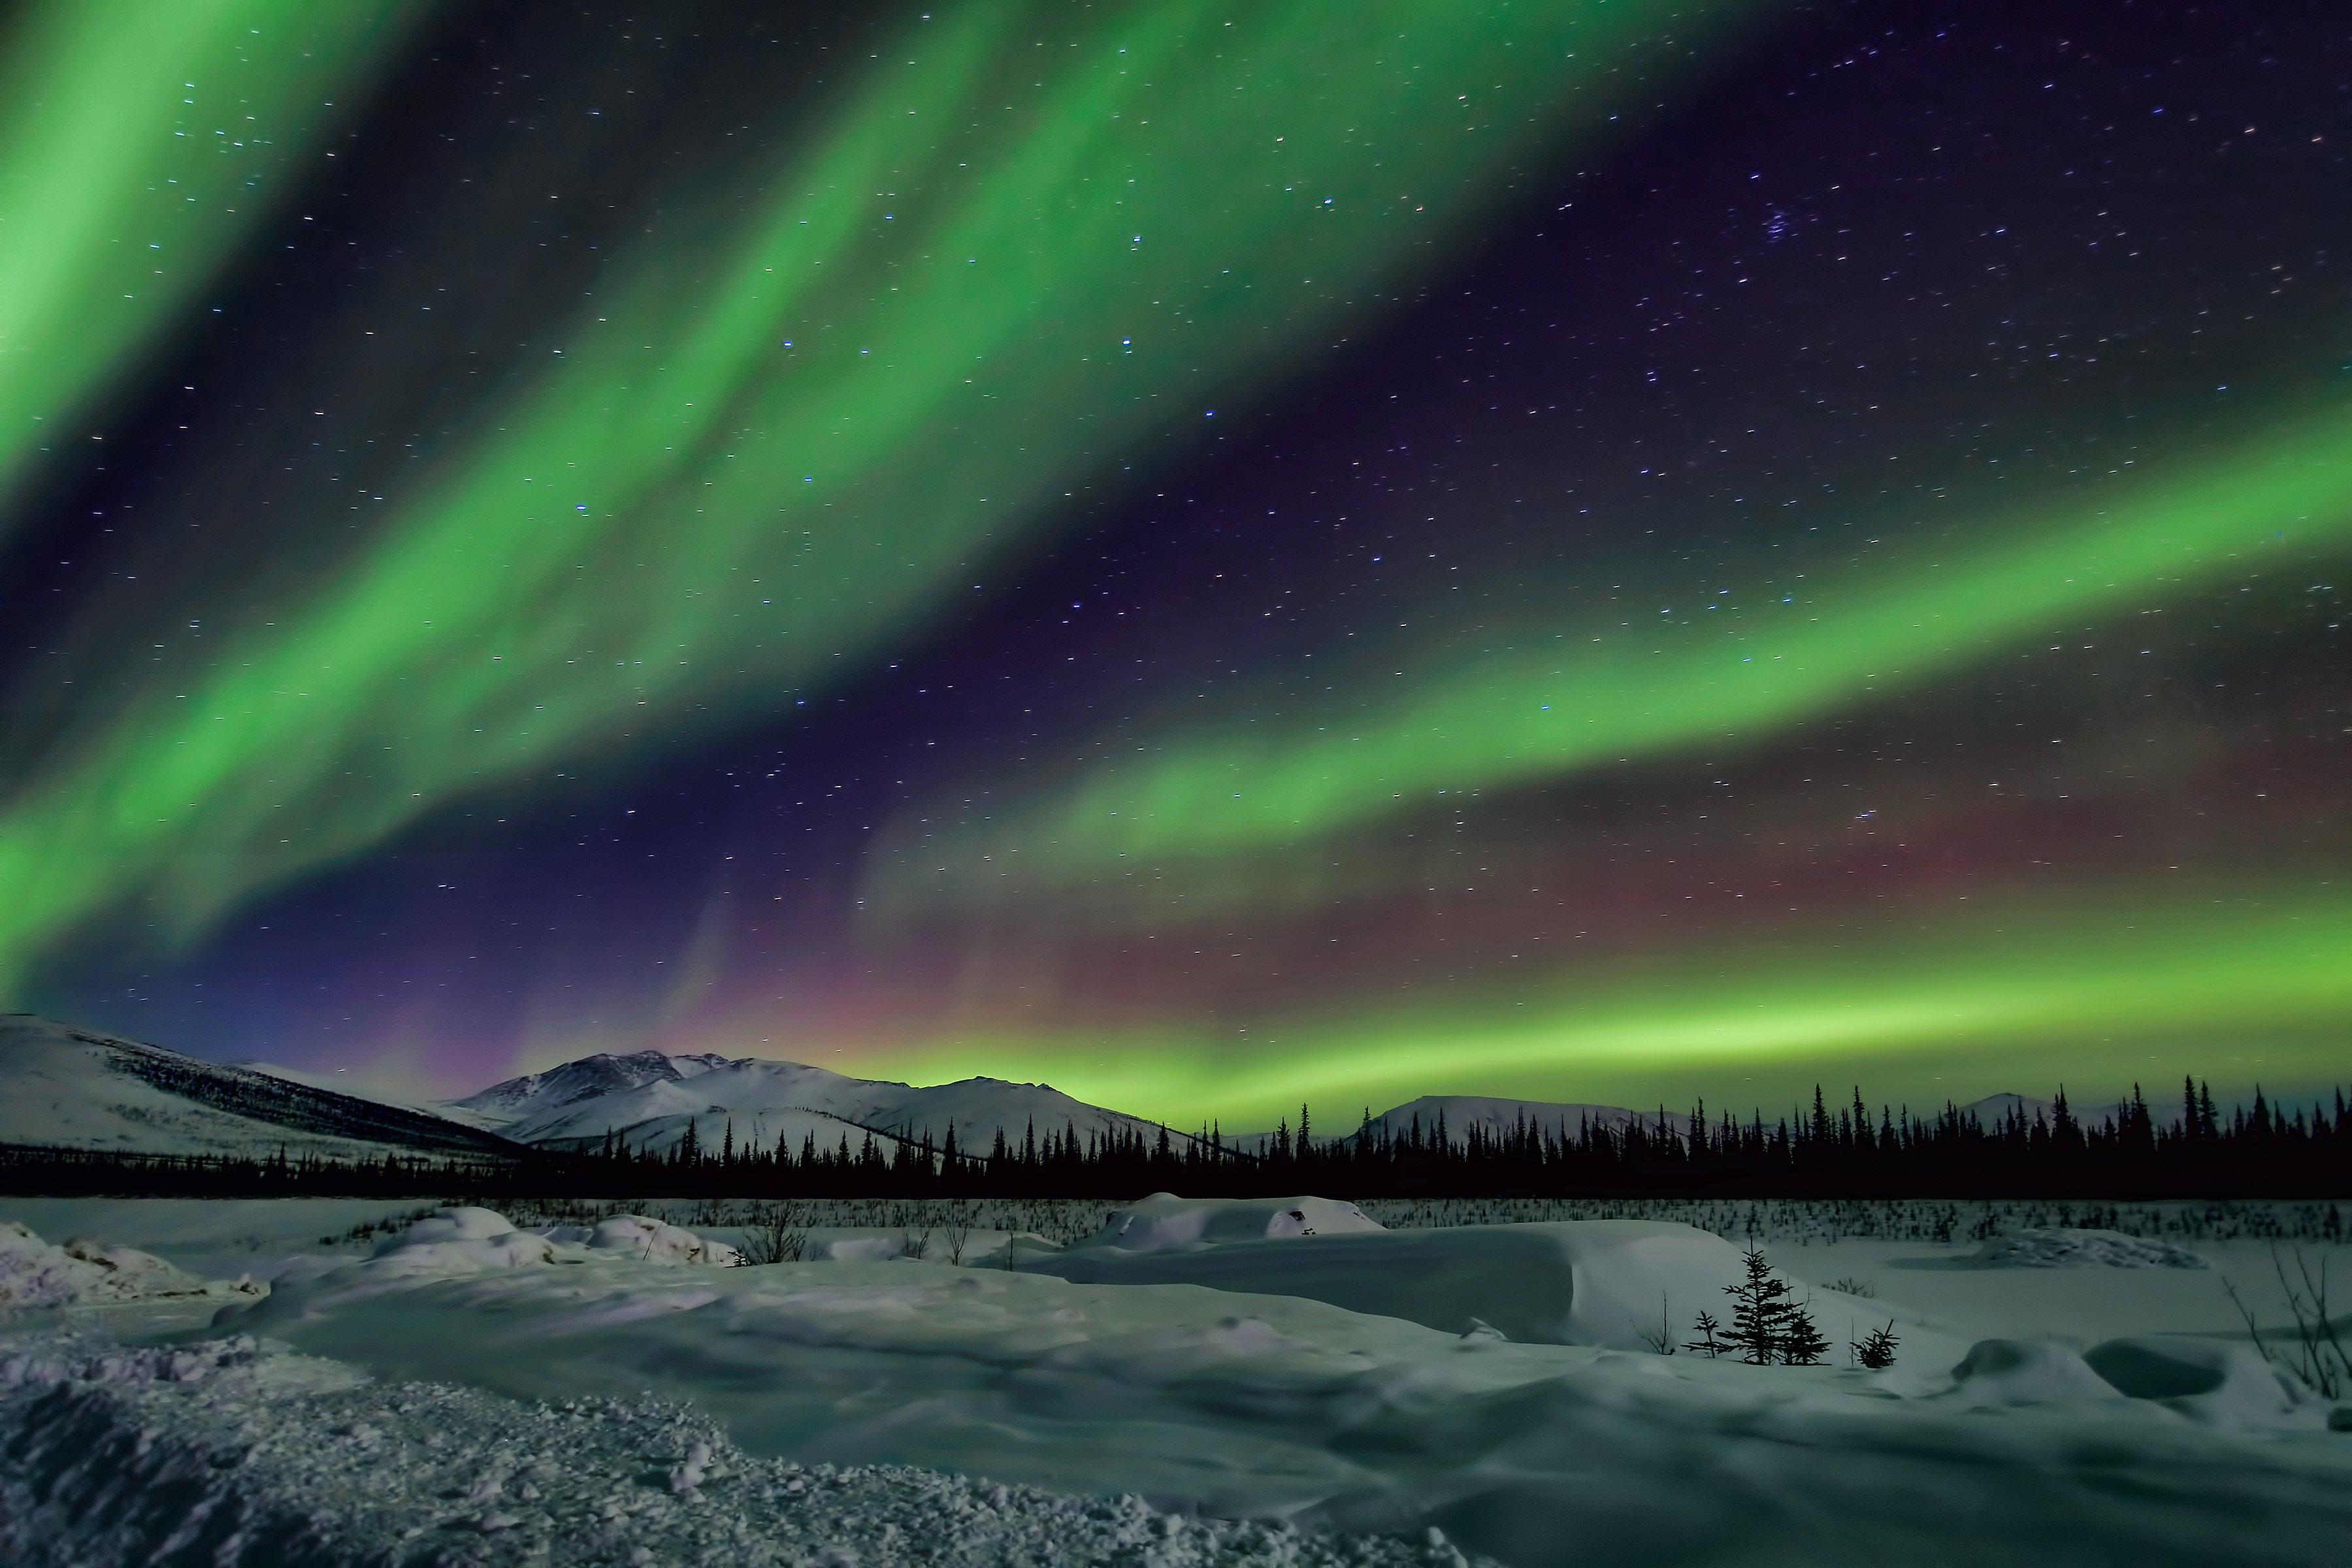 northern lights wallpaper 4k - photo #11